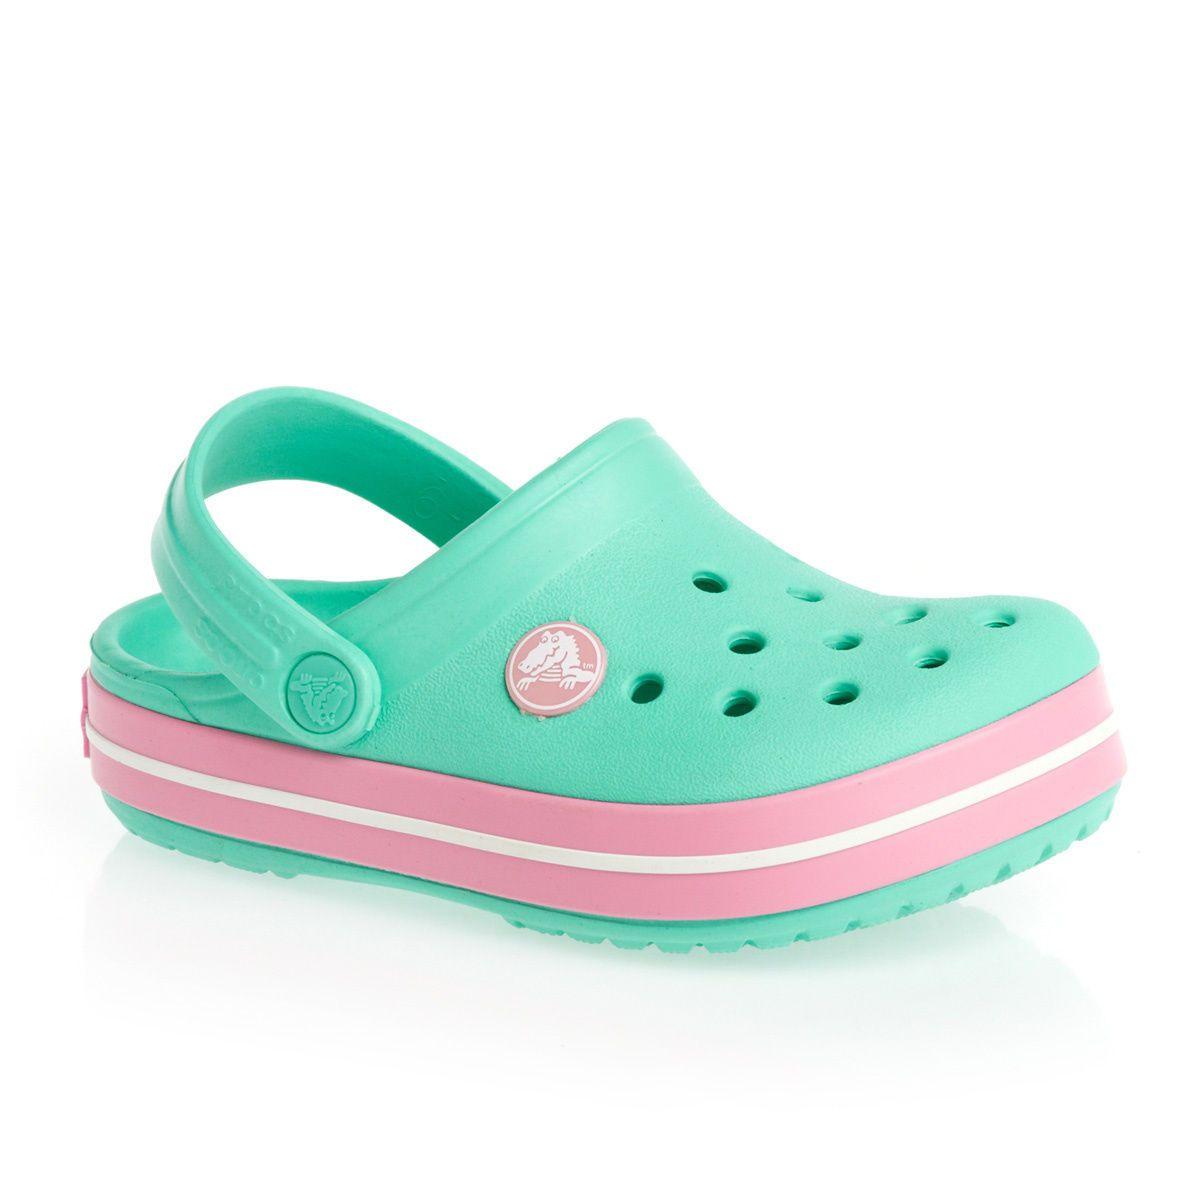 Zapatos verdes vintage Crocs Crocband para mujer Outlet Genuine XAhijqDk